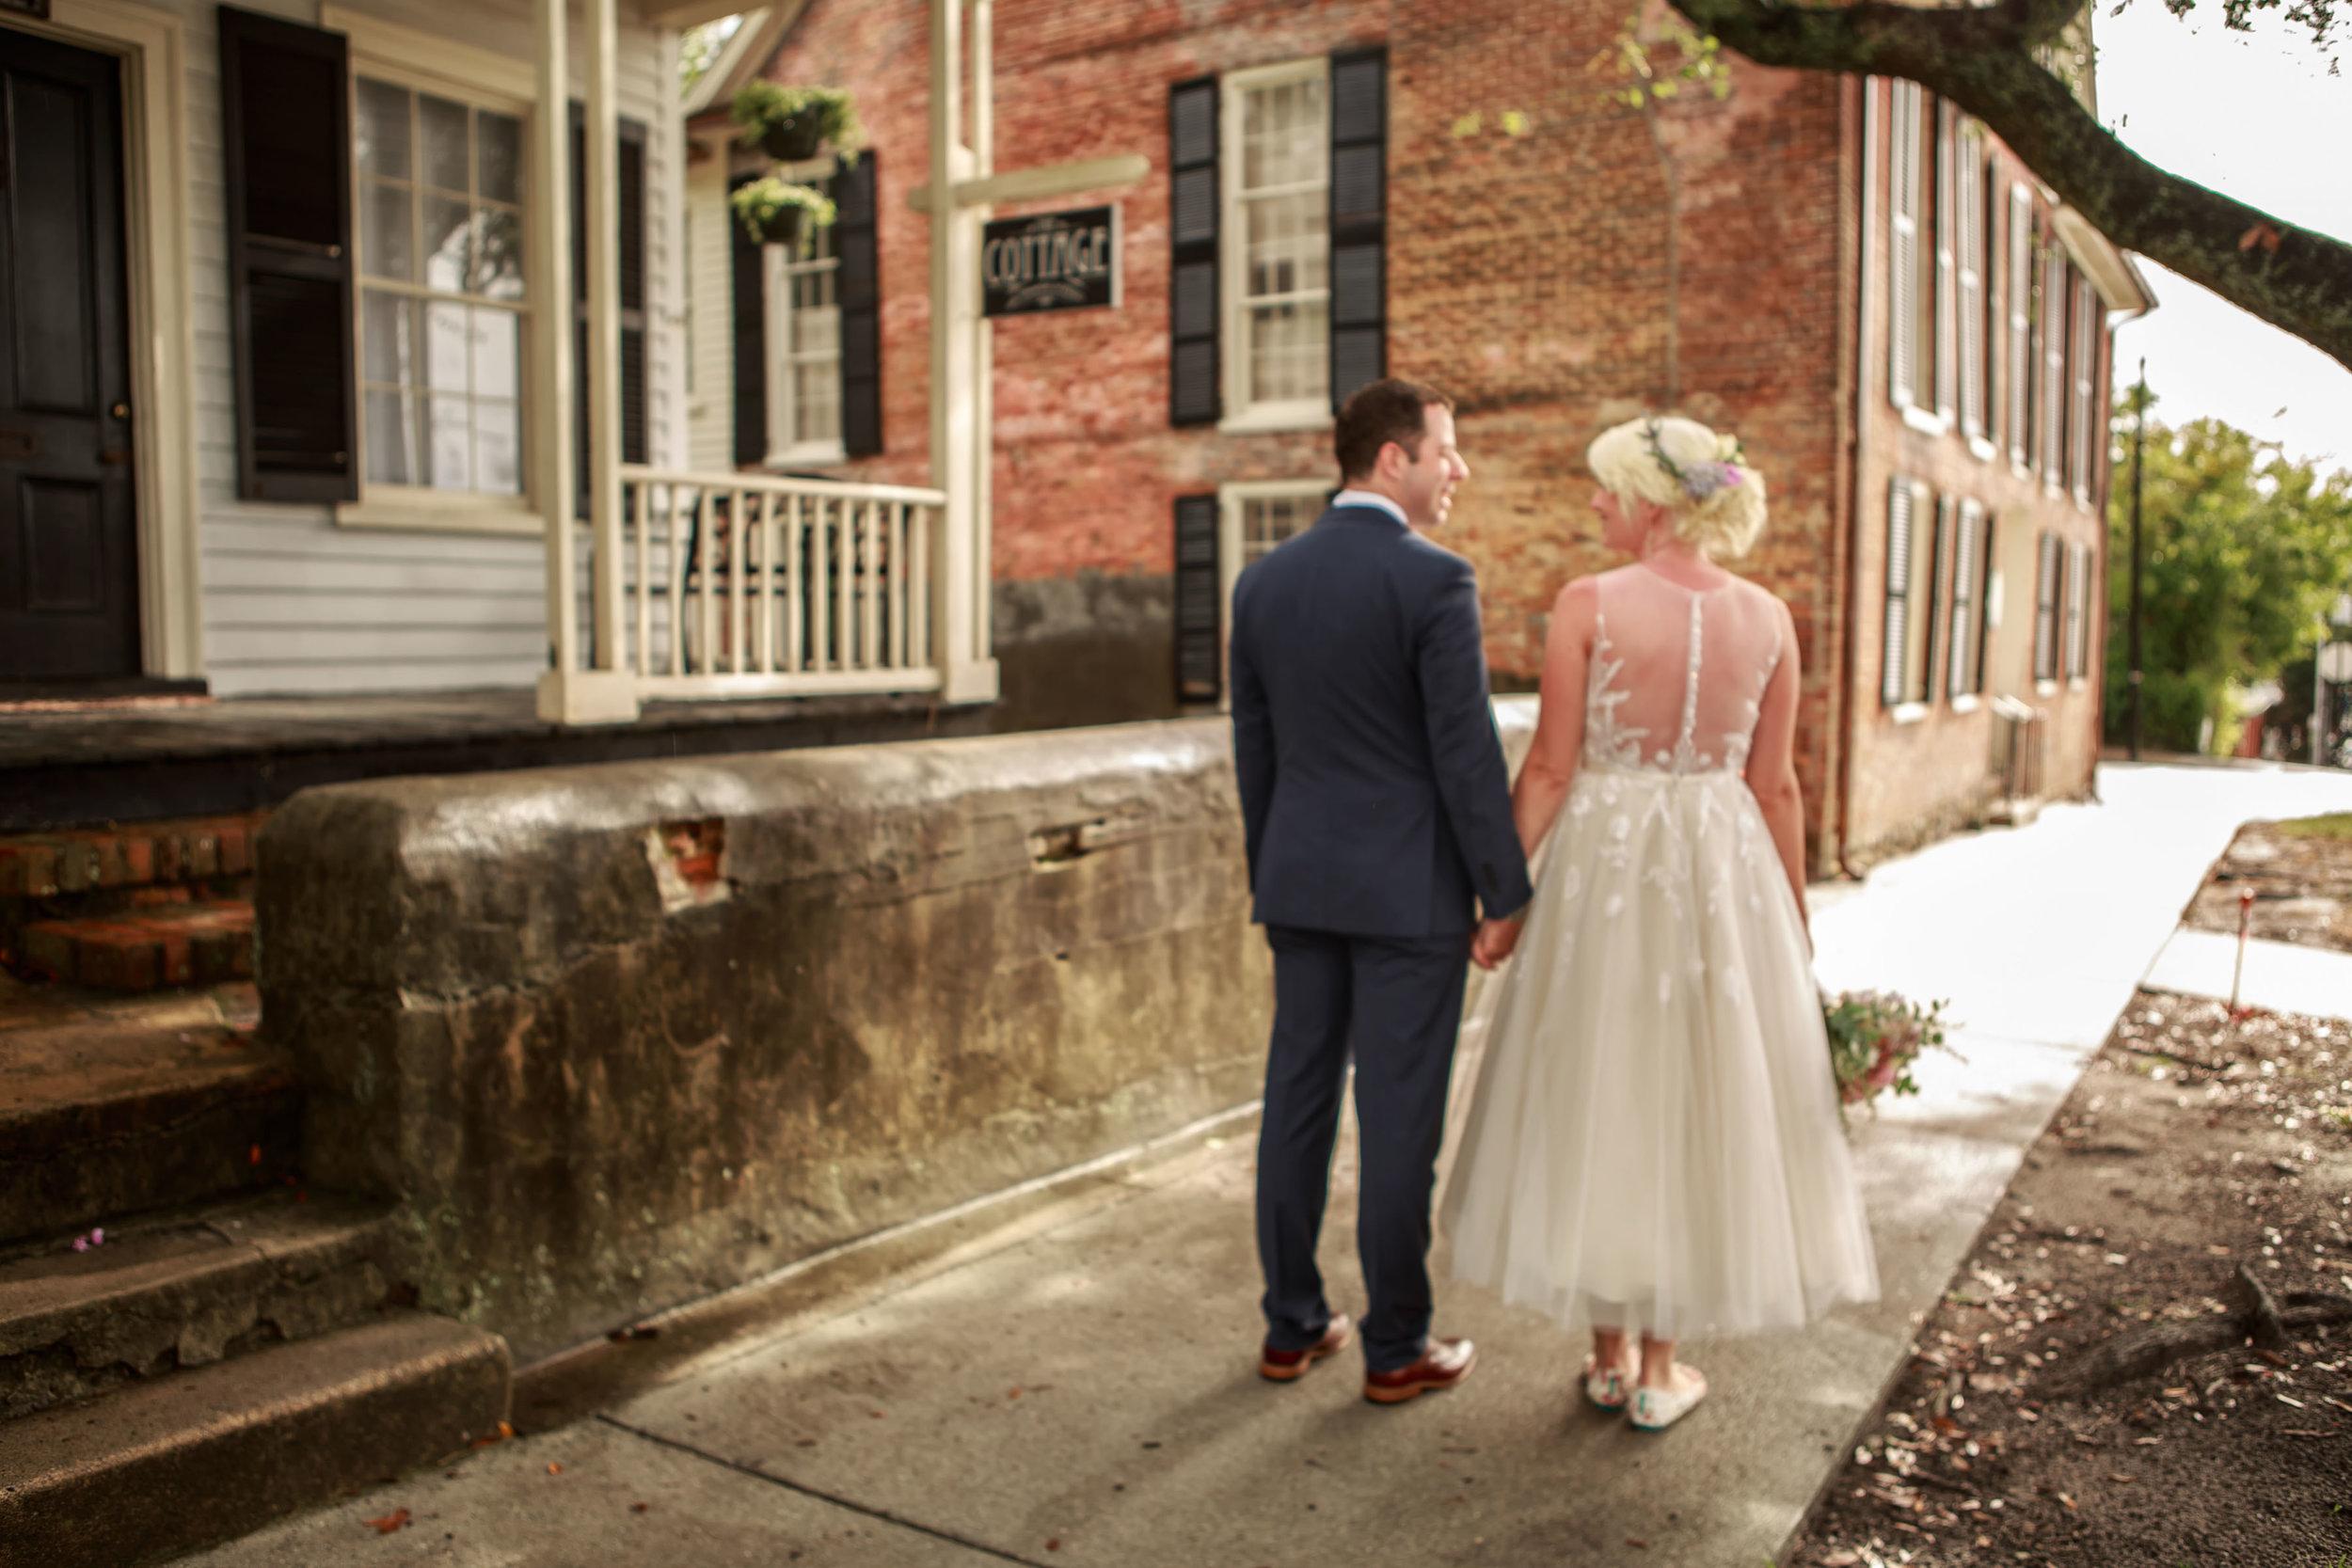 128-South-Wedding-Tiffany-Abruzzo-Photography-Bride-&-Groom-46.jpg